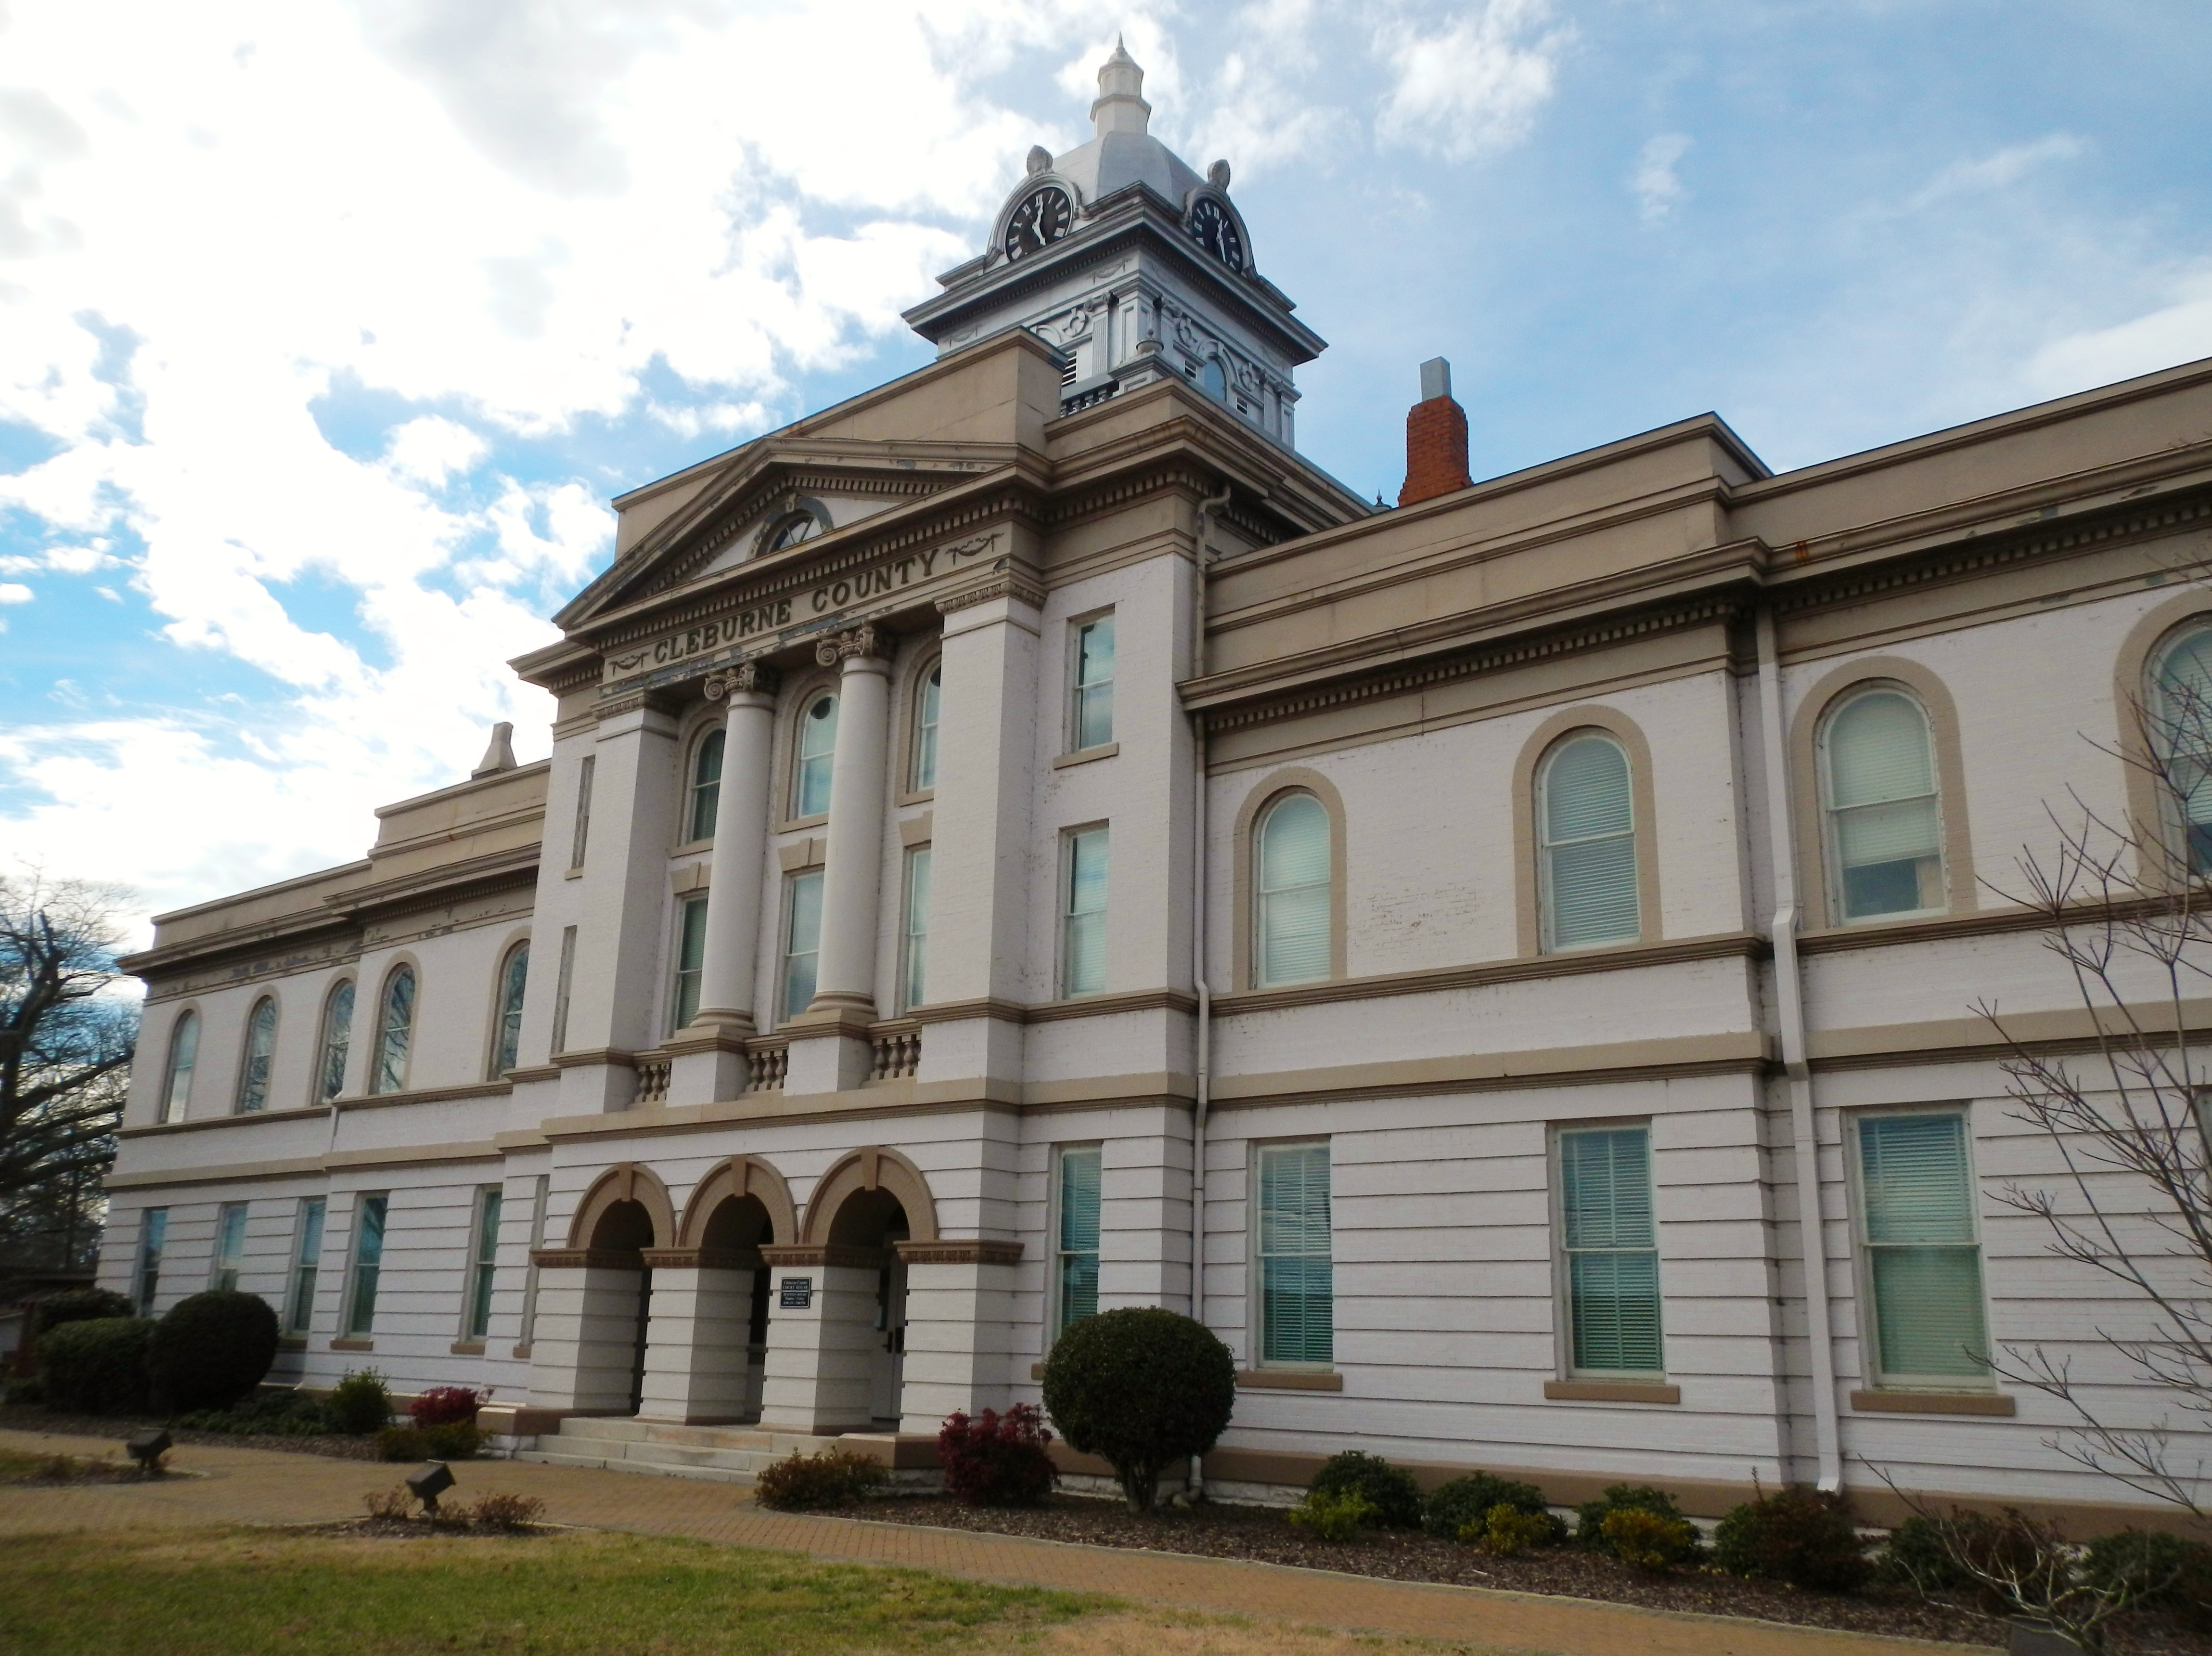 File:Cleburne County Alabama Courthouse 2012.JPG - Wikimedia Commonsbalance of cleburne county